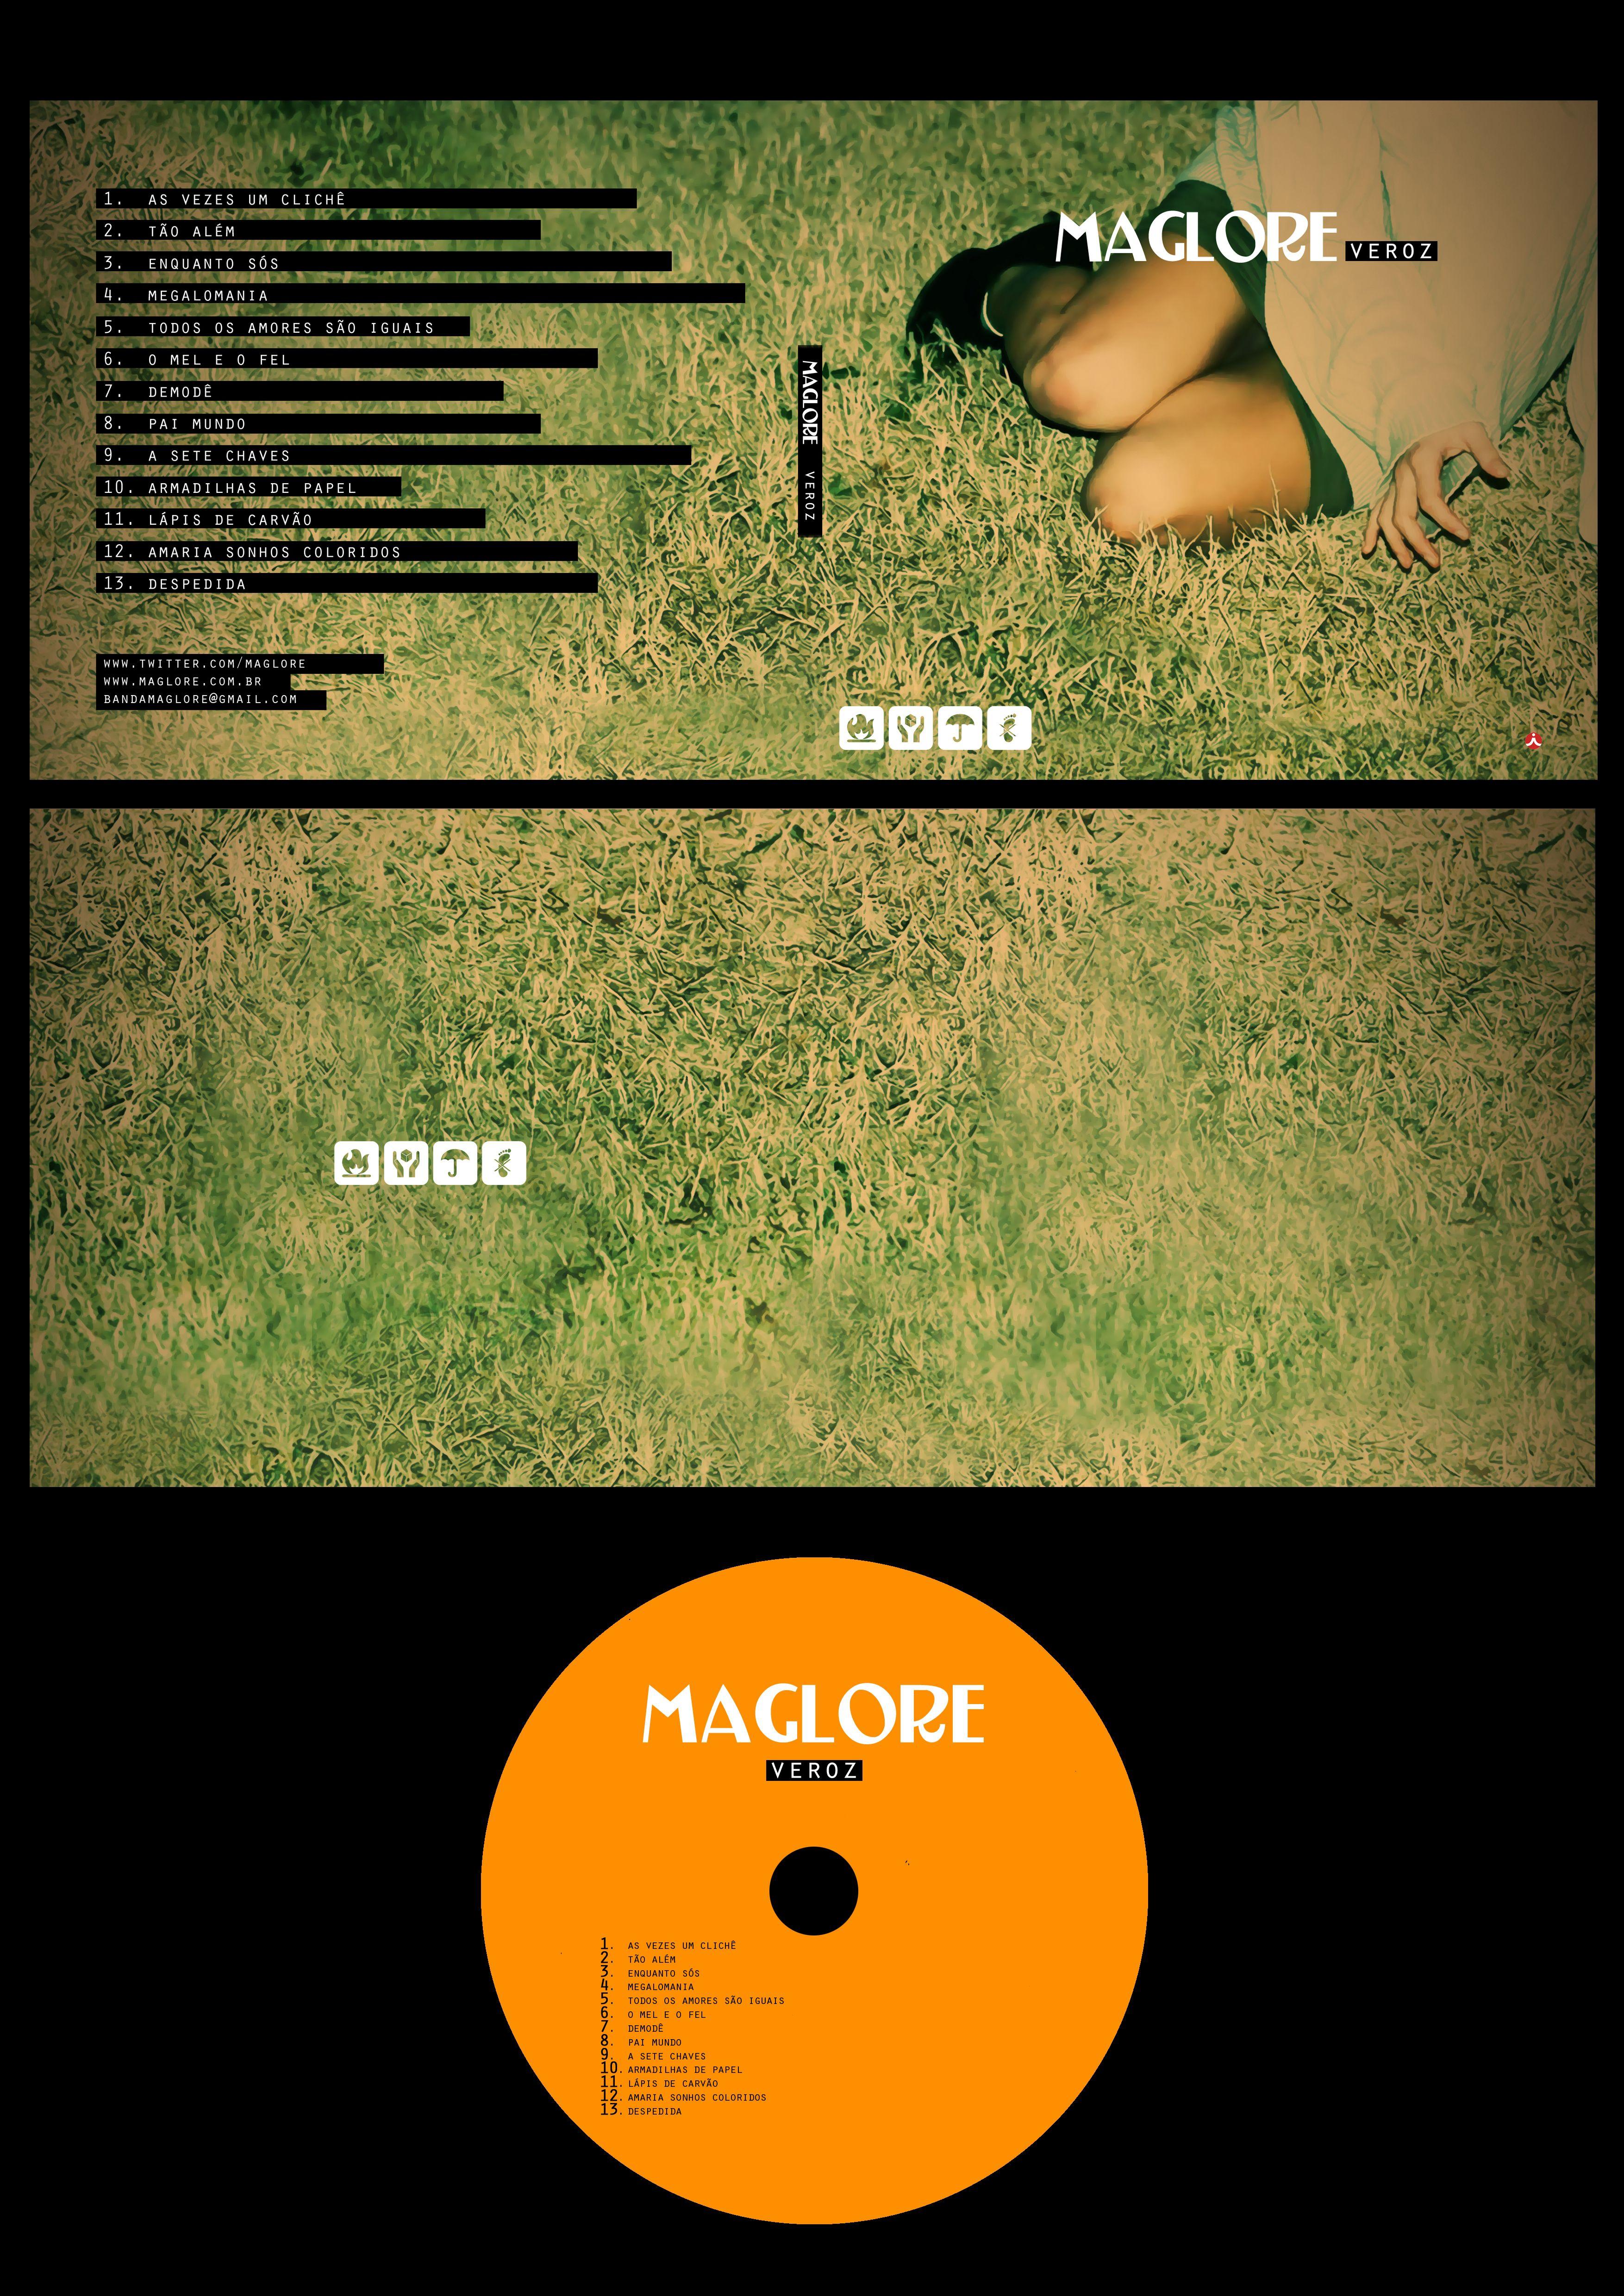 Arte para CD da banda MAGLORE